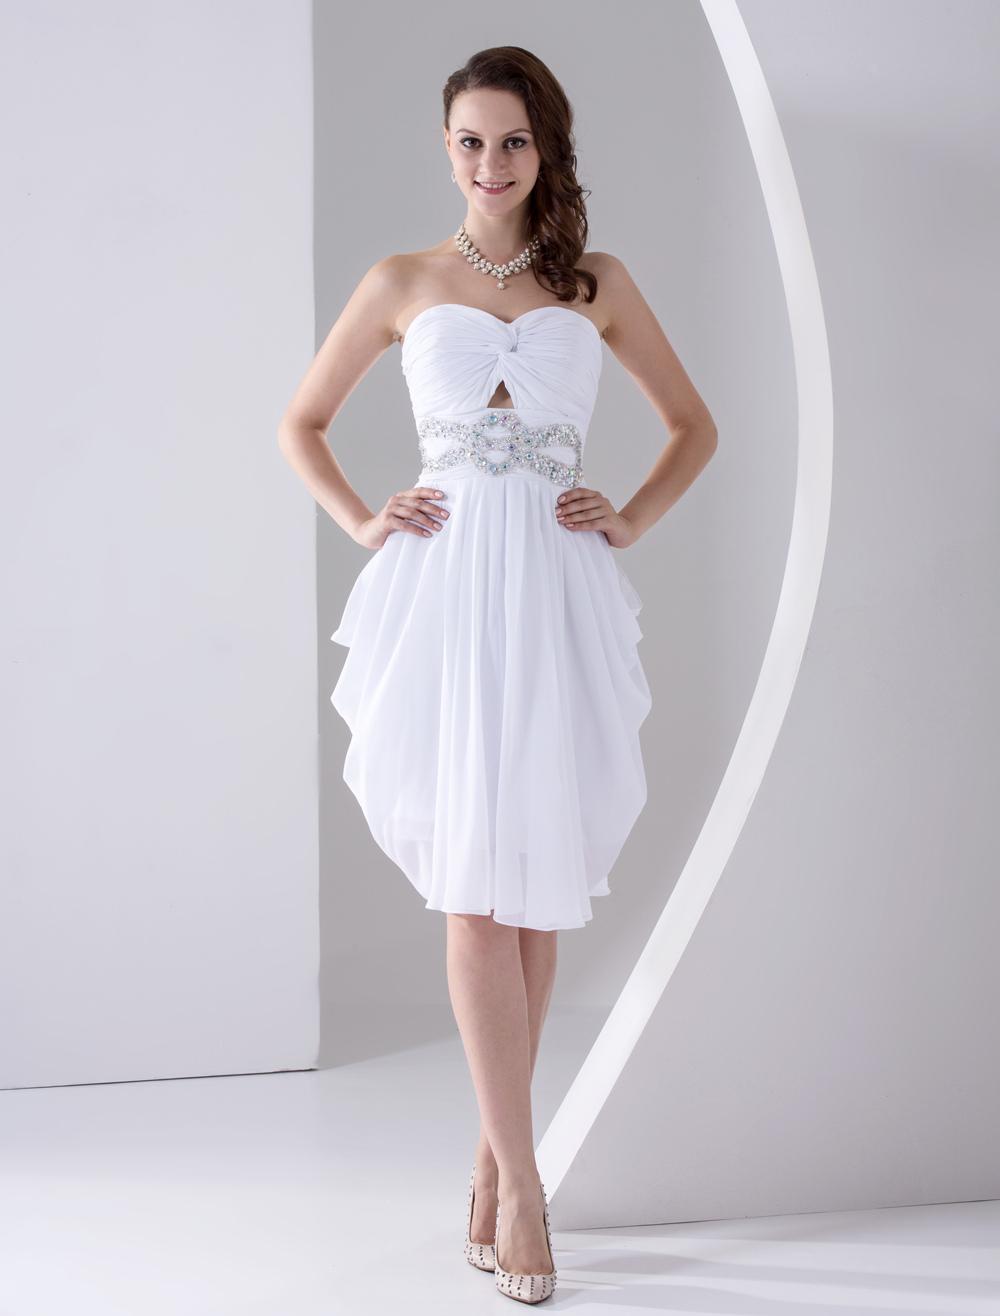 White Prom Dress Rhinestone Strapless Backless Dress (Wedding Cheap Party Dress) photo